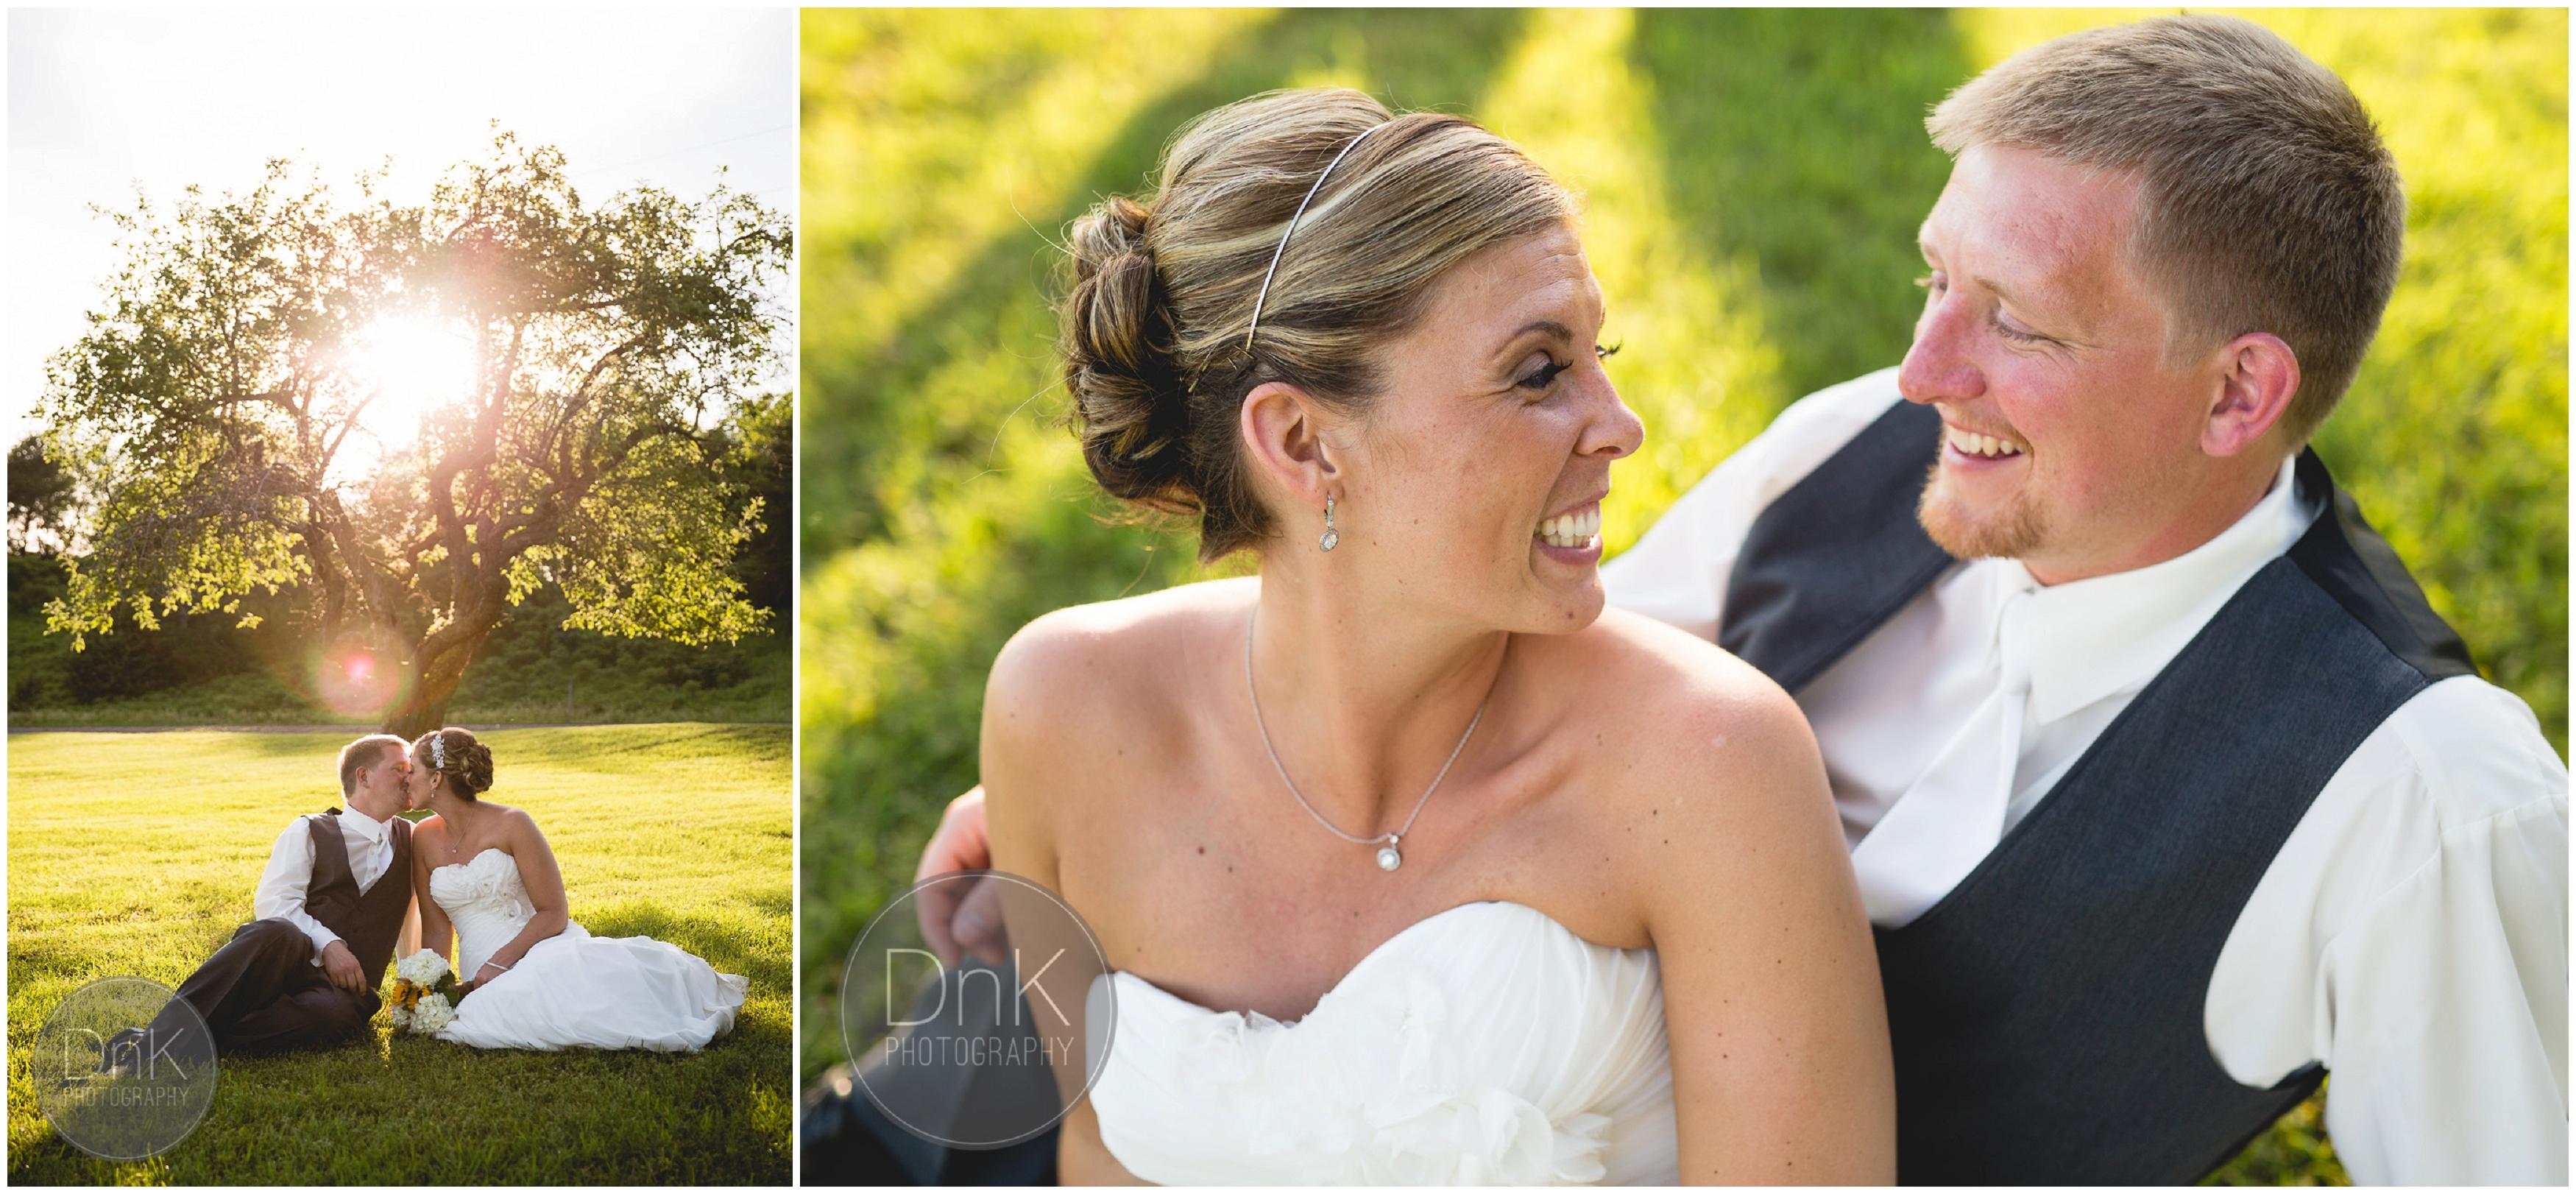 41- Outdoor Wedding Pictures Wedding Photographer